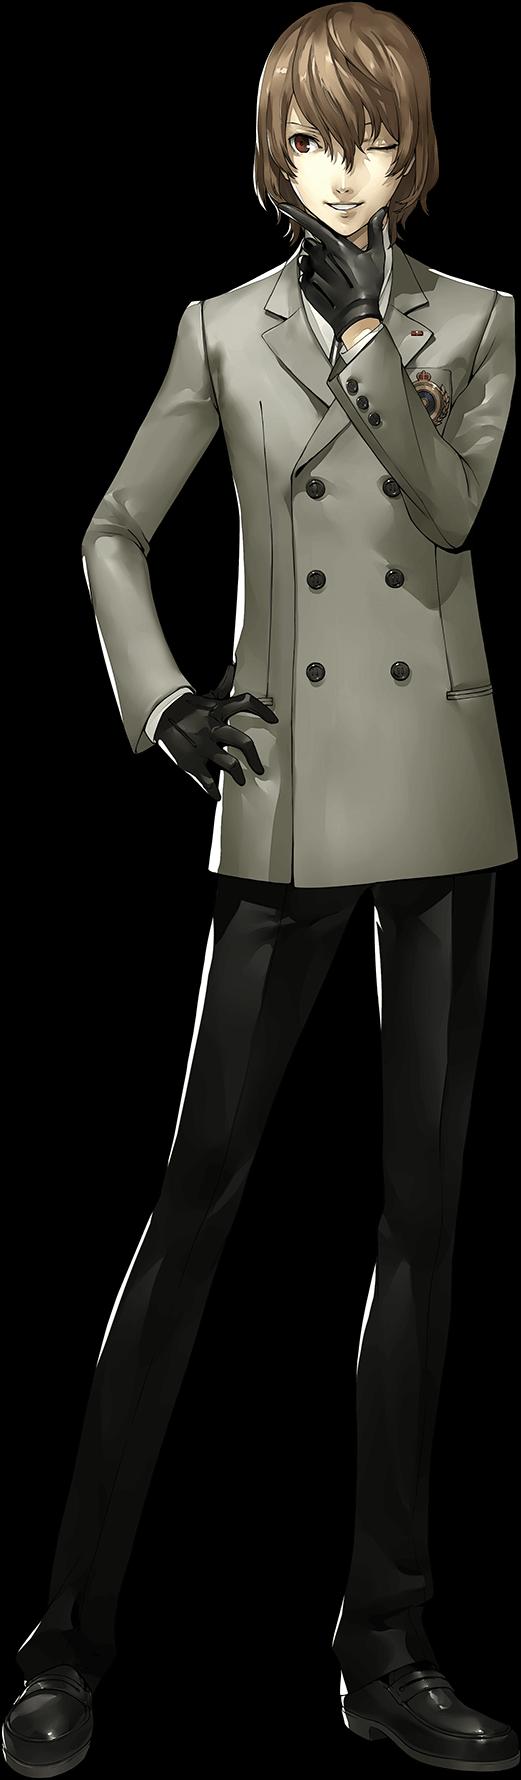 P5_Goro_Akechi-Personagem_Persona-5